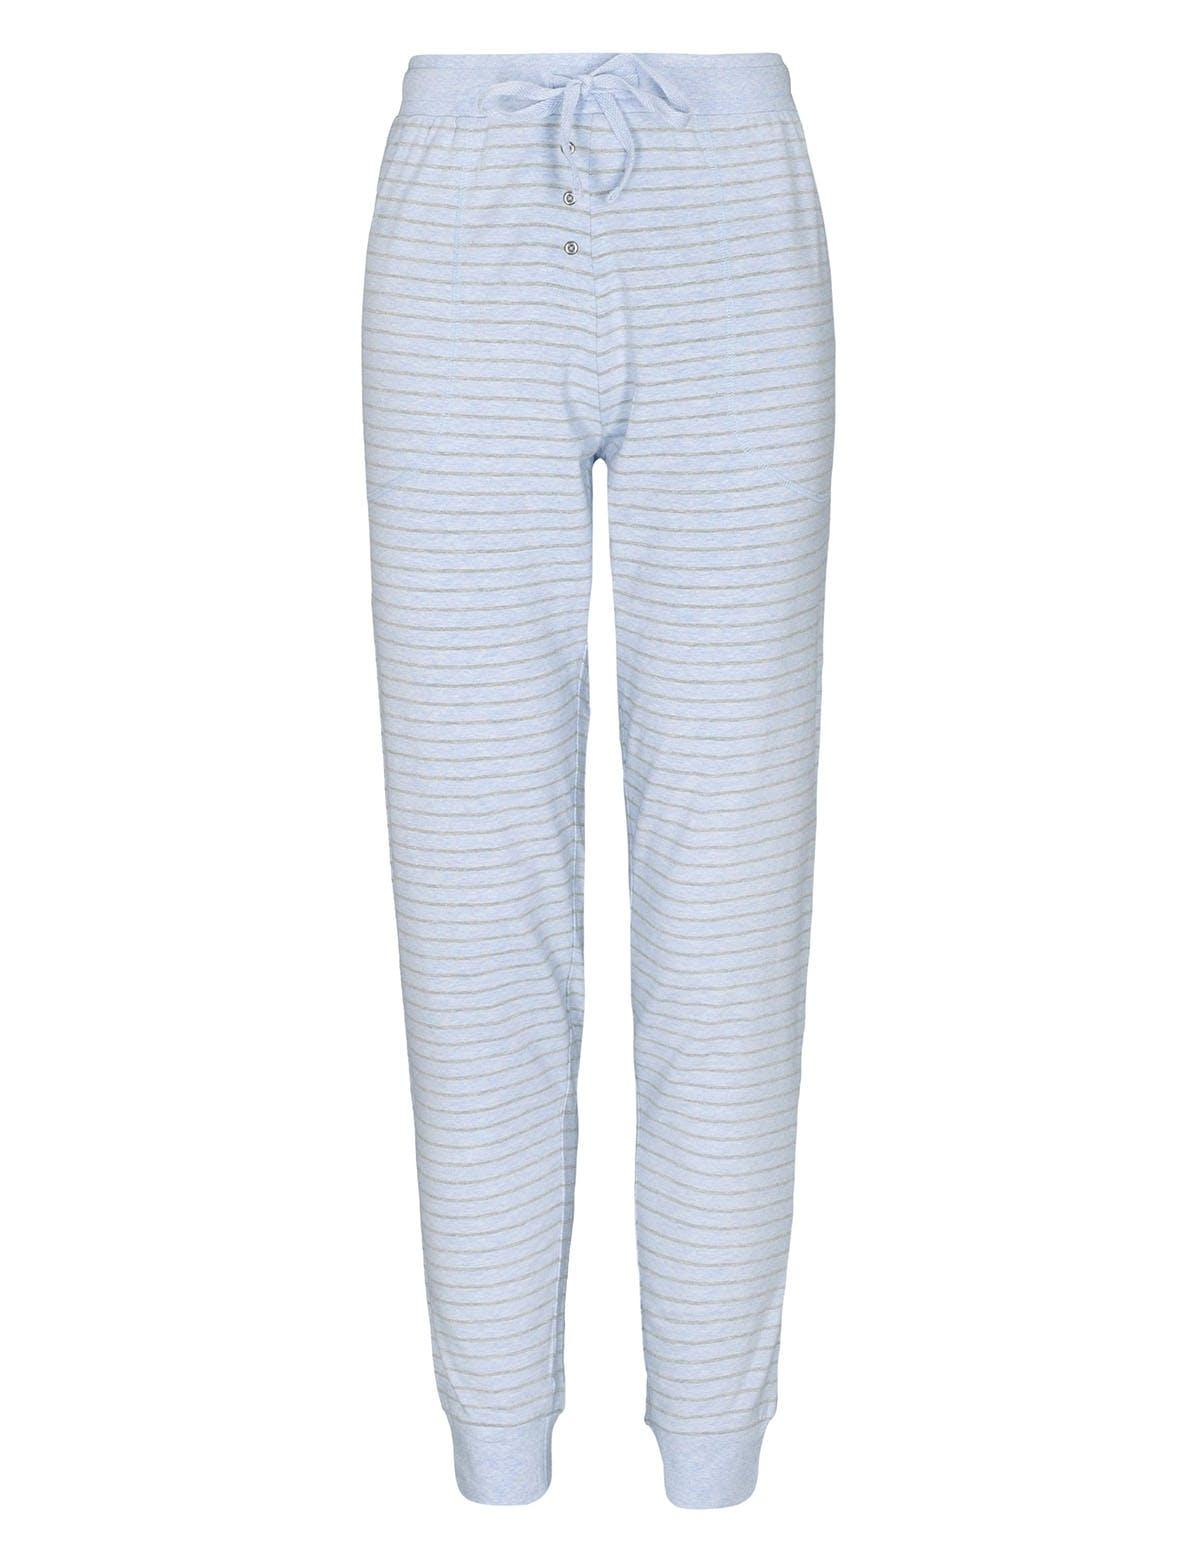 HOMEWEAR Hose im Streifen-Design - Bleu